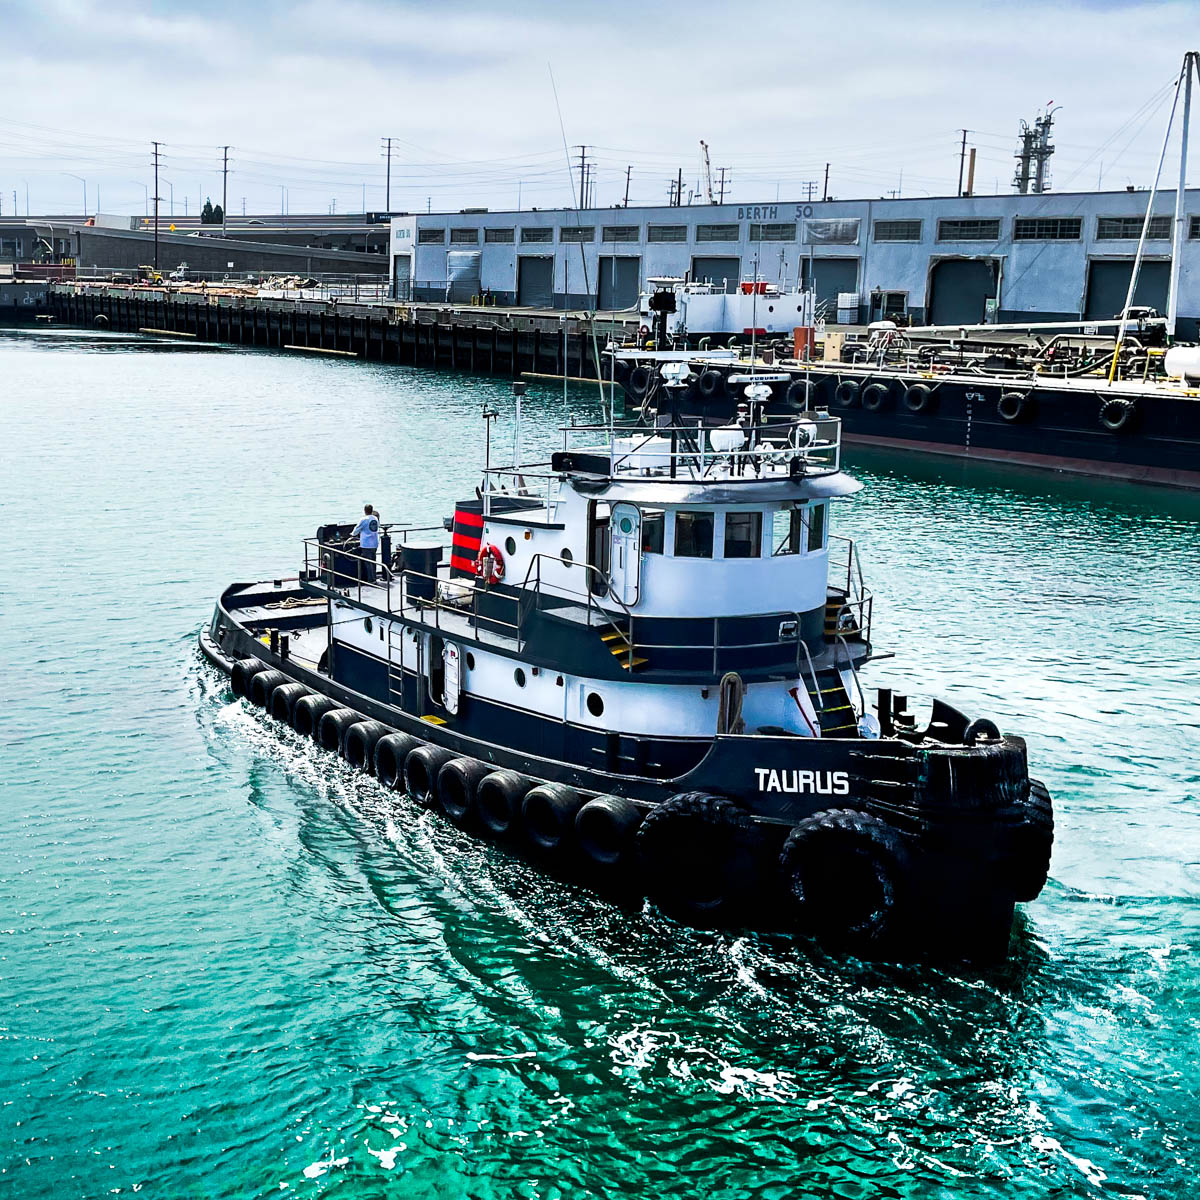 Taurus Tugboat